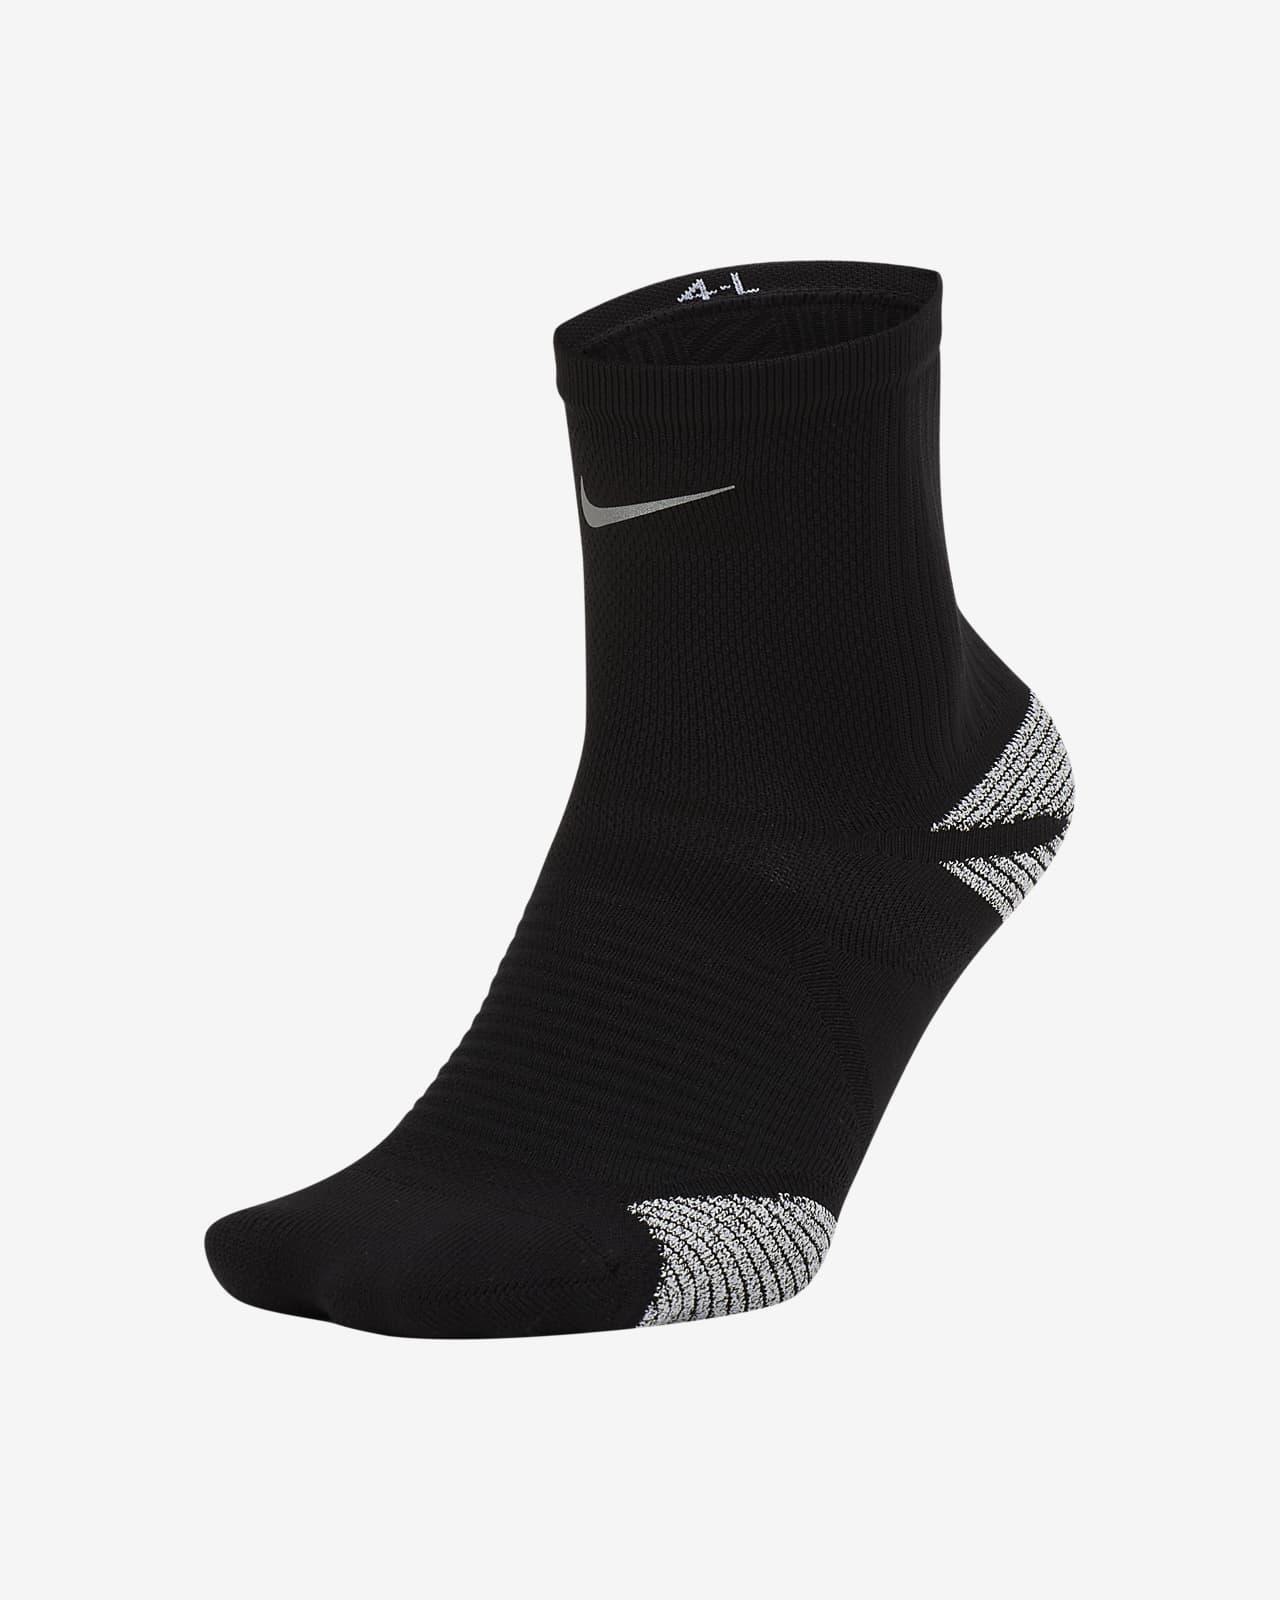 Calze alla caviglia Nike Racing